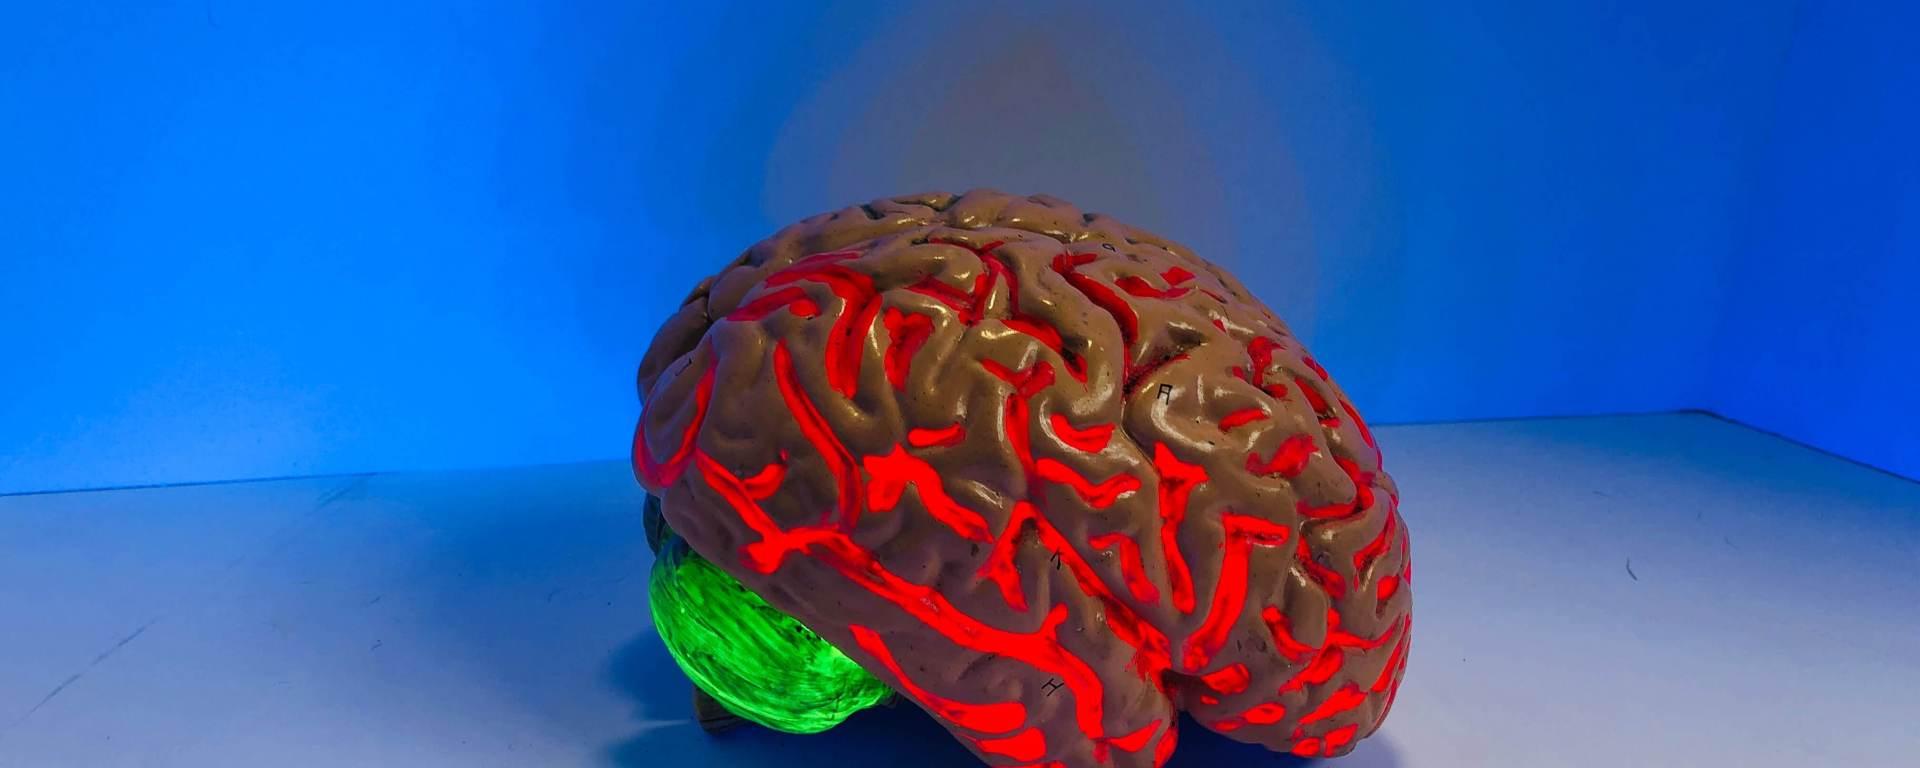 A model brain